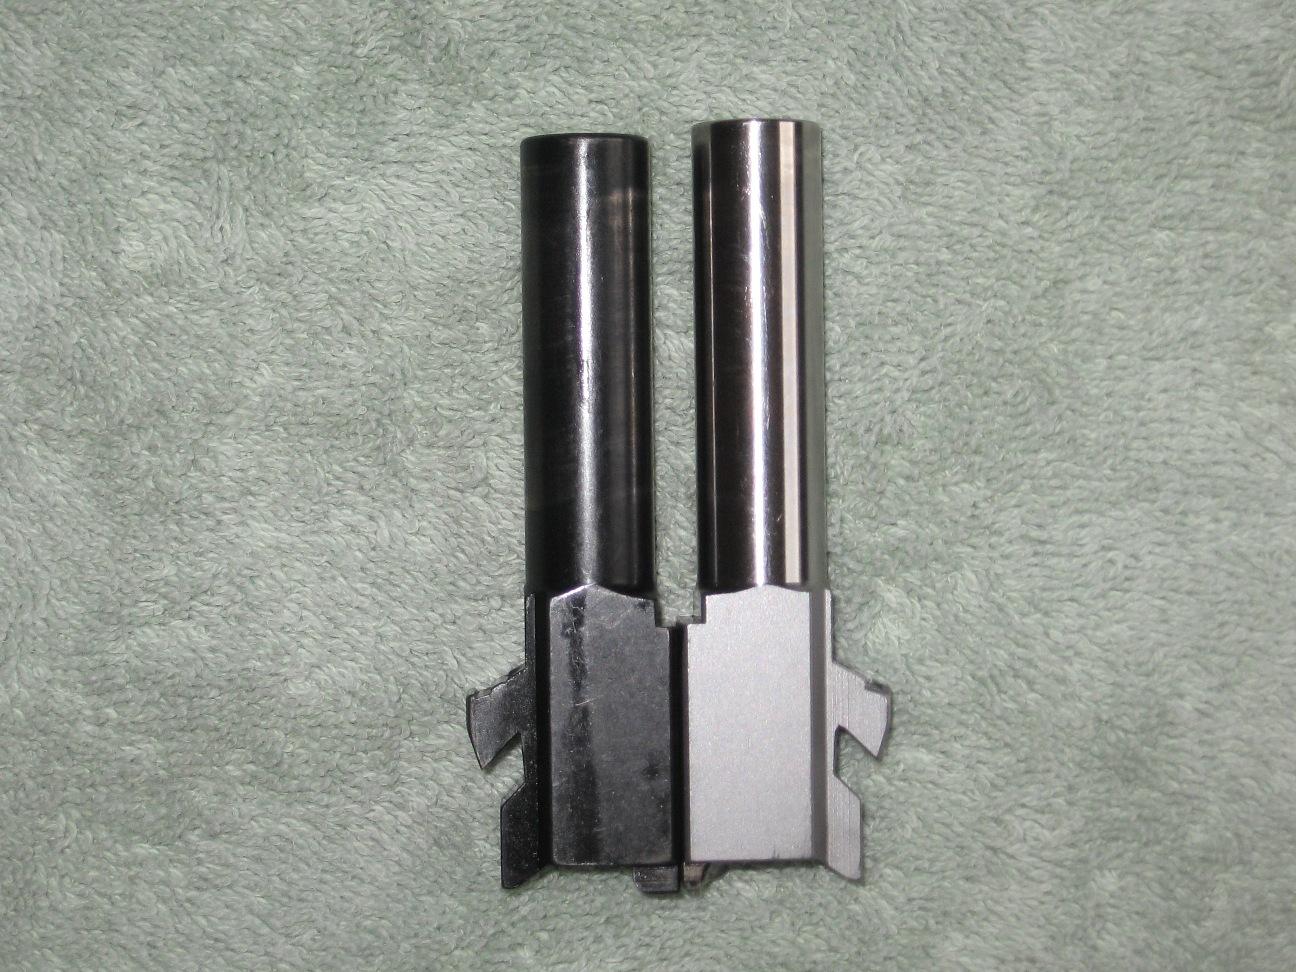 Glock 27 to 9mm: Storm Lake vs  Lone Wolf range report